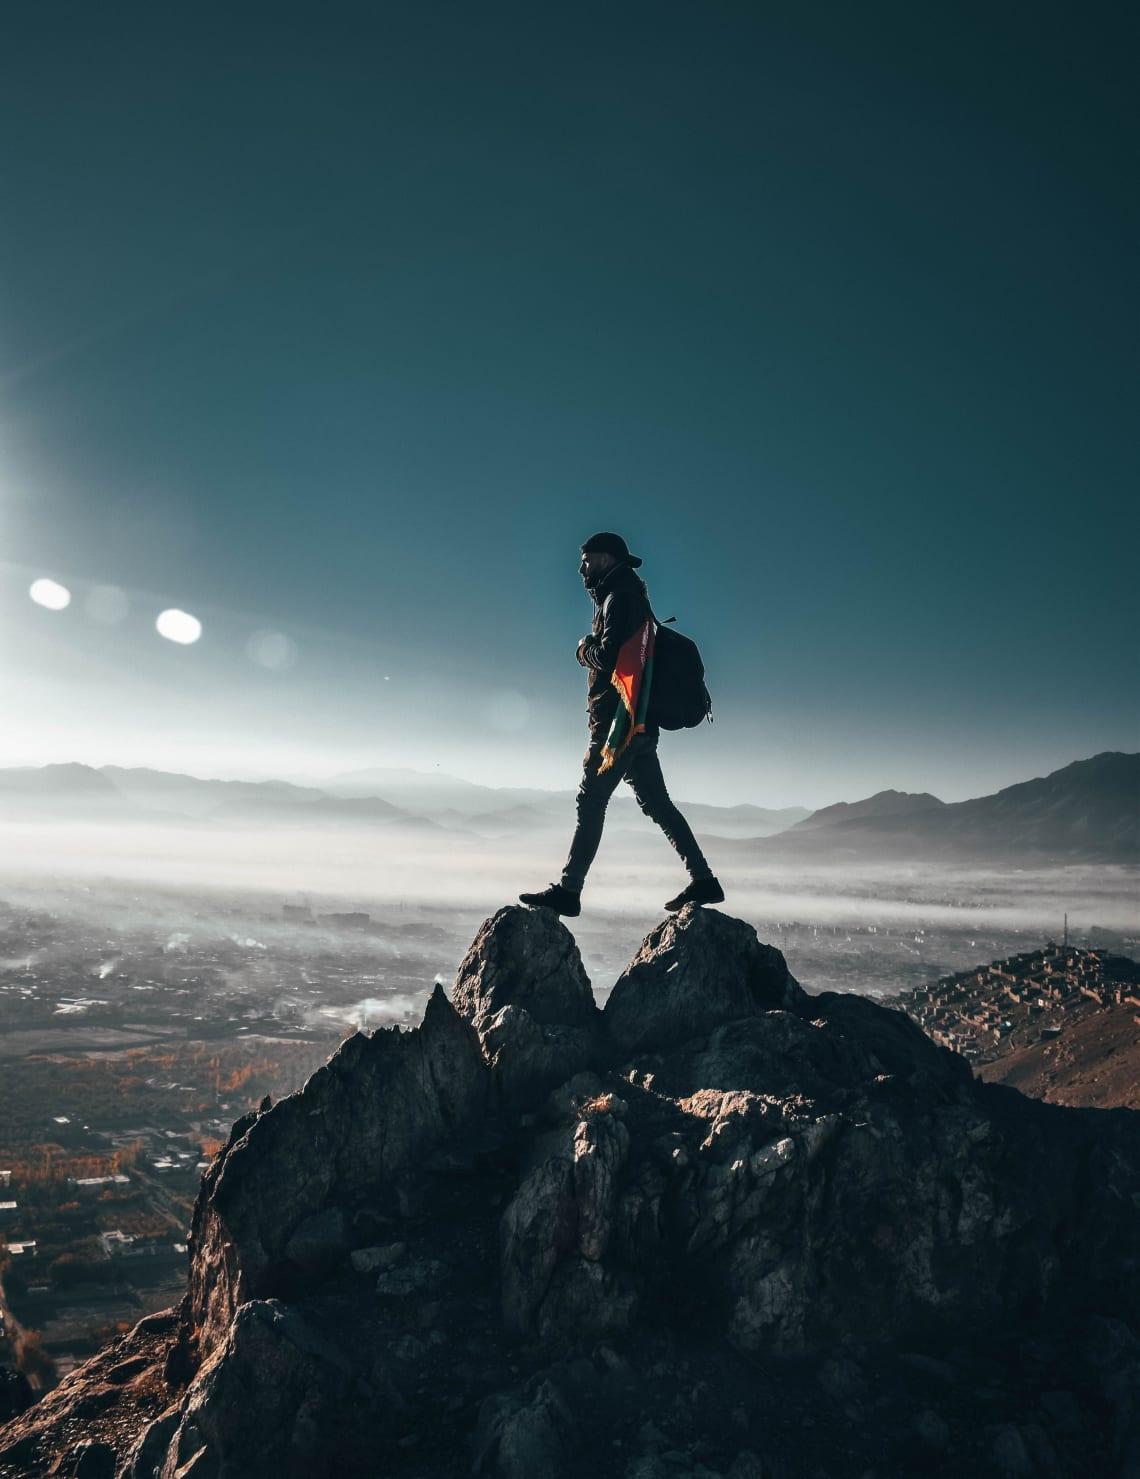 Solo adventurer on a mountaintop